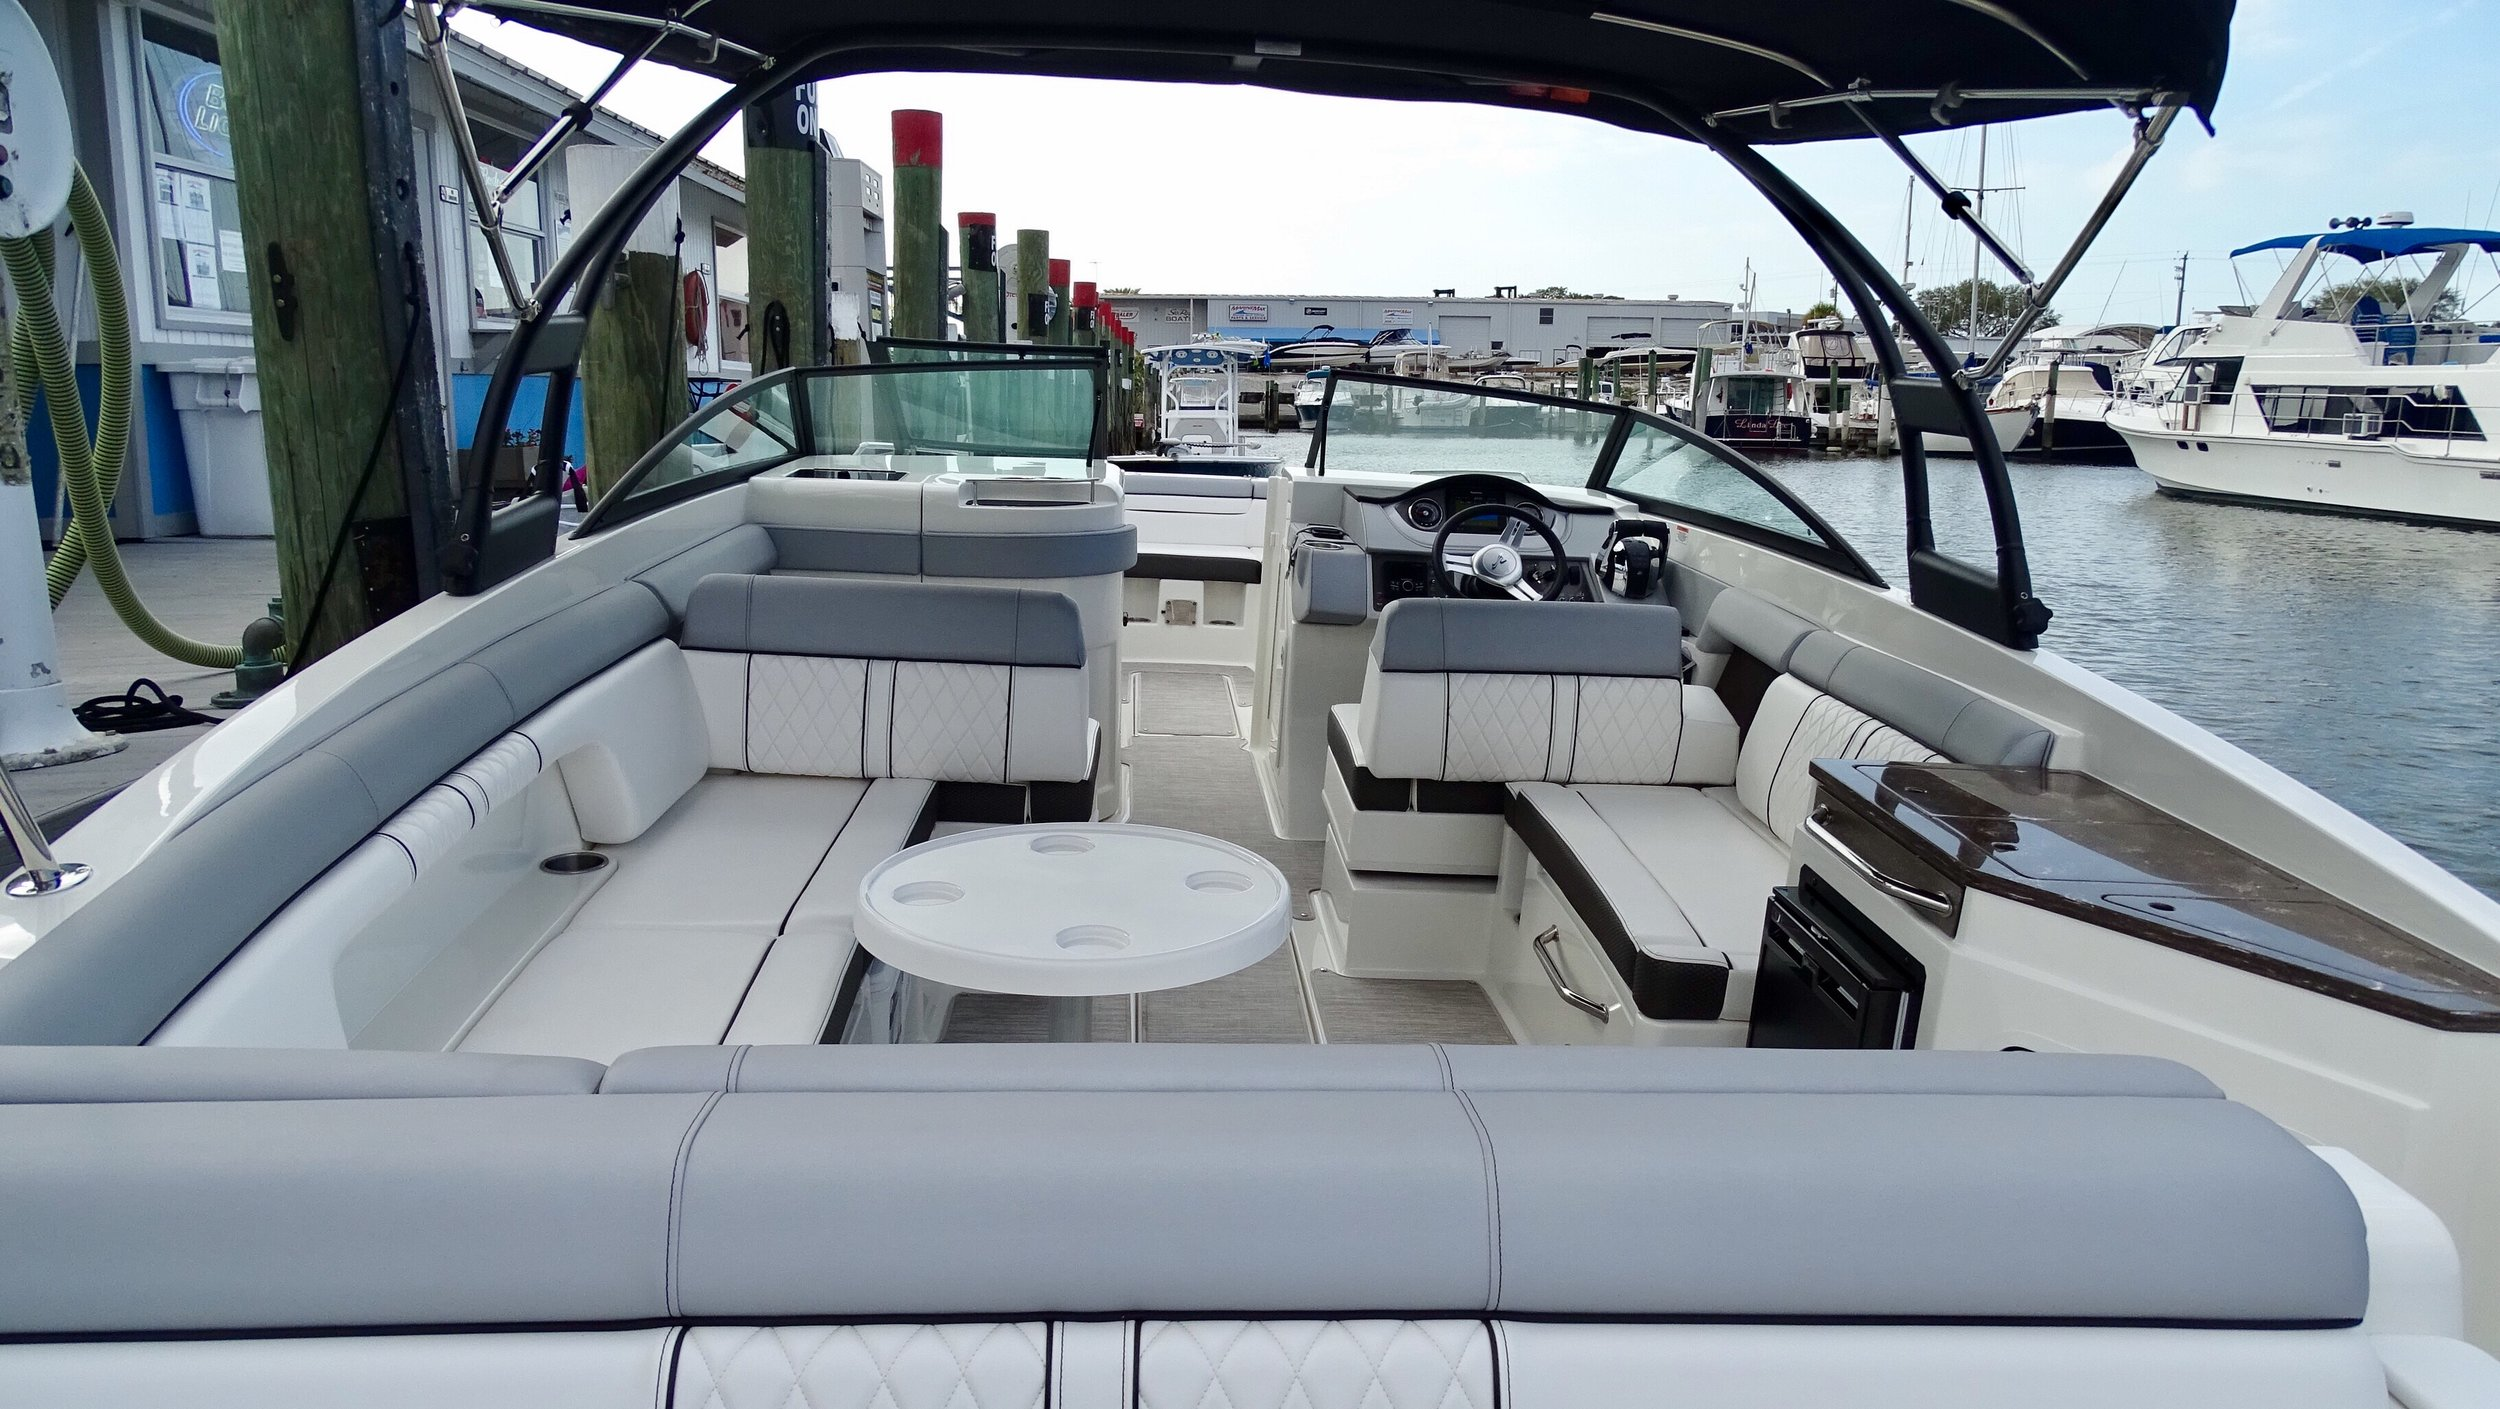 Sarasota Boat Rides.JPG